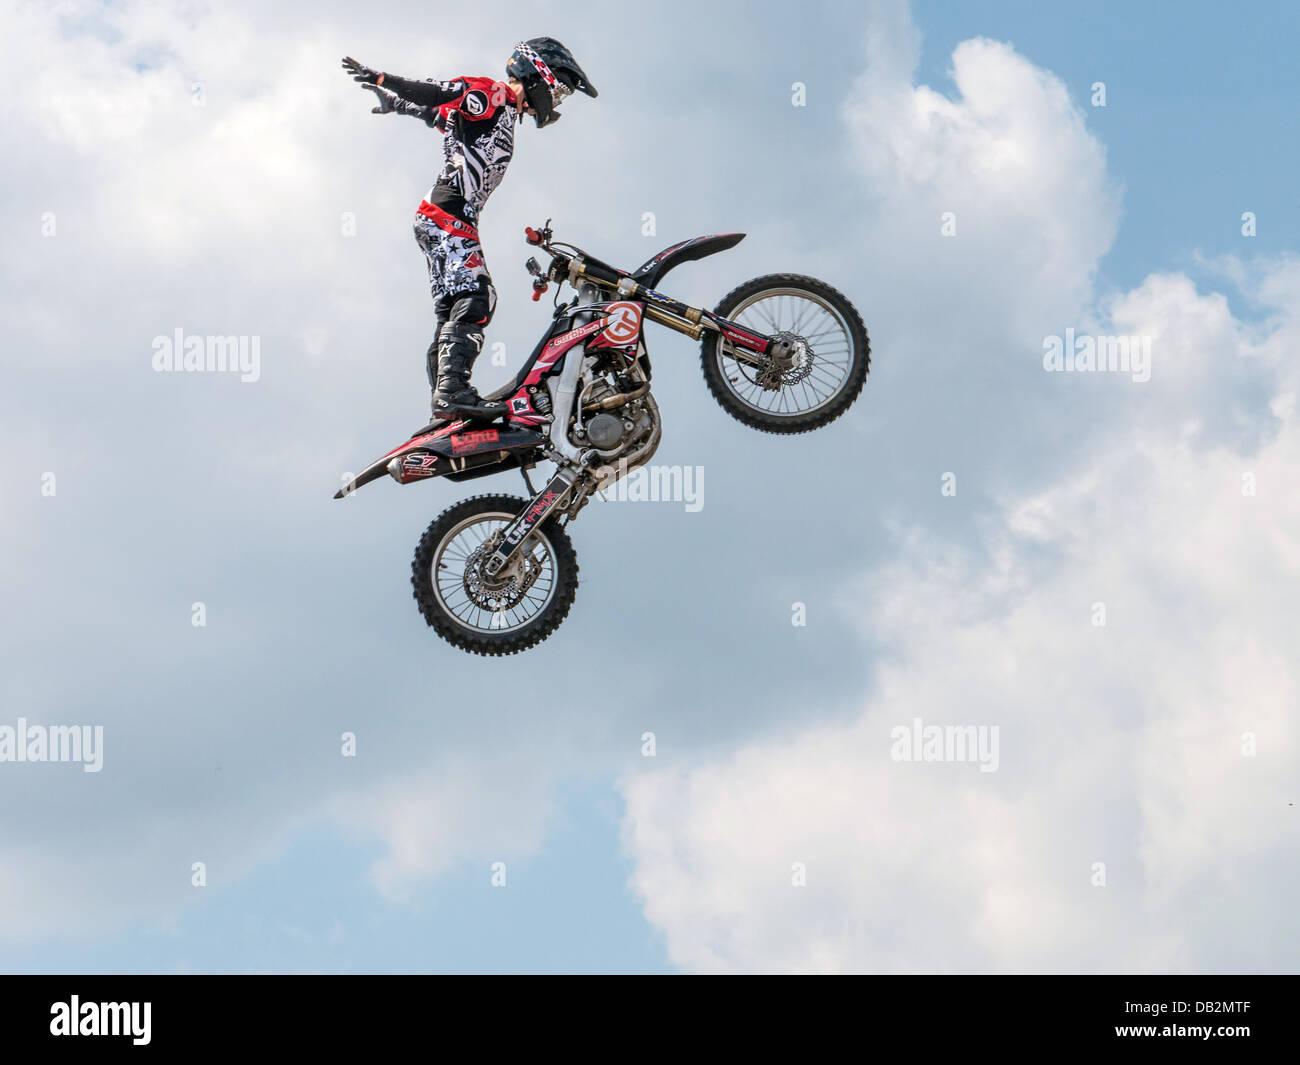 Freestyle Moto cross 2013 - Stock Image